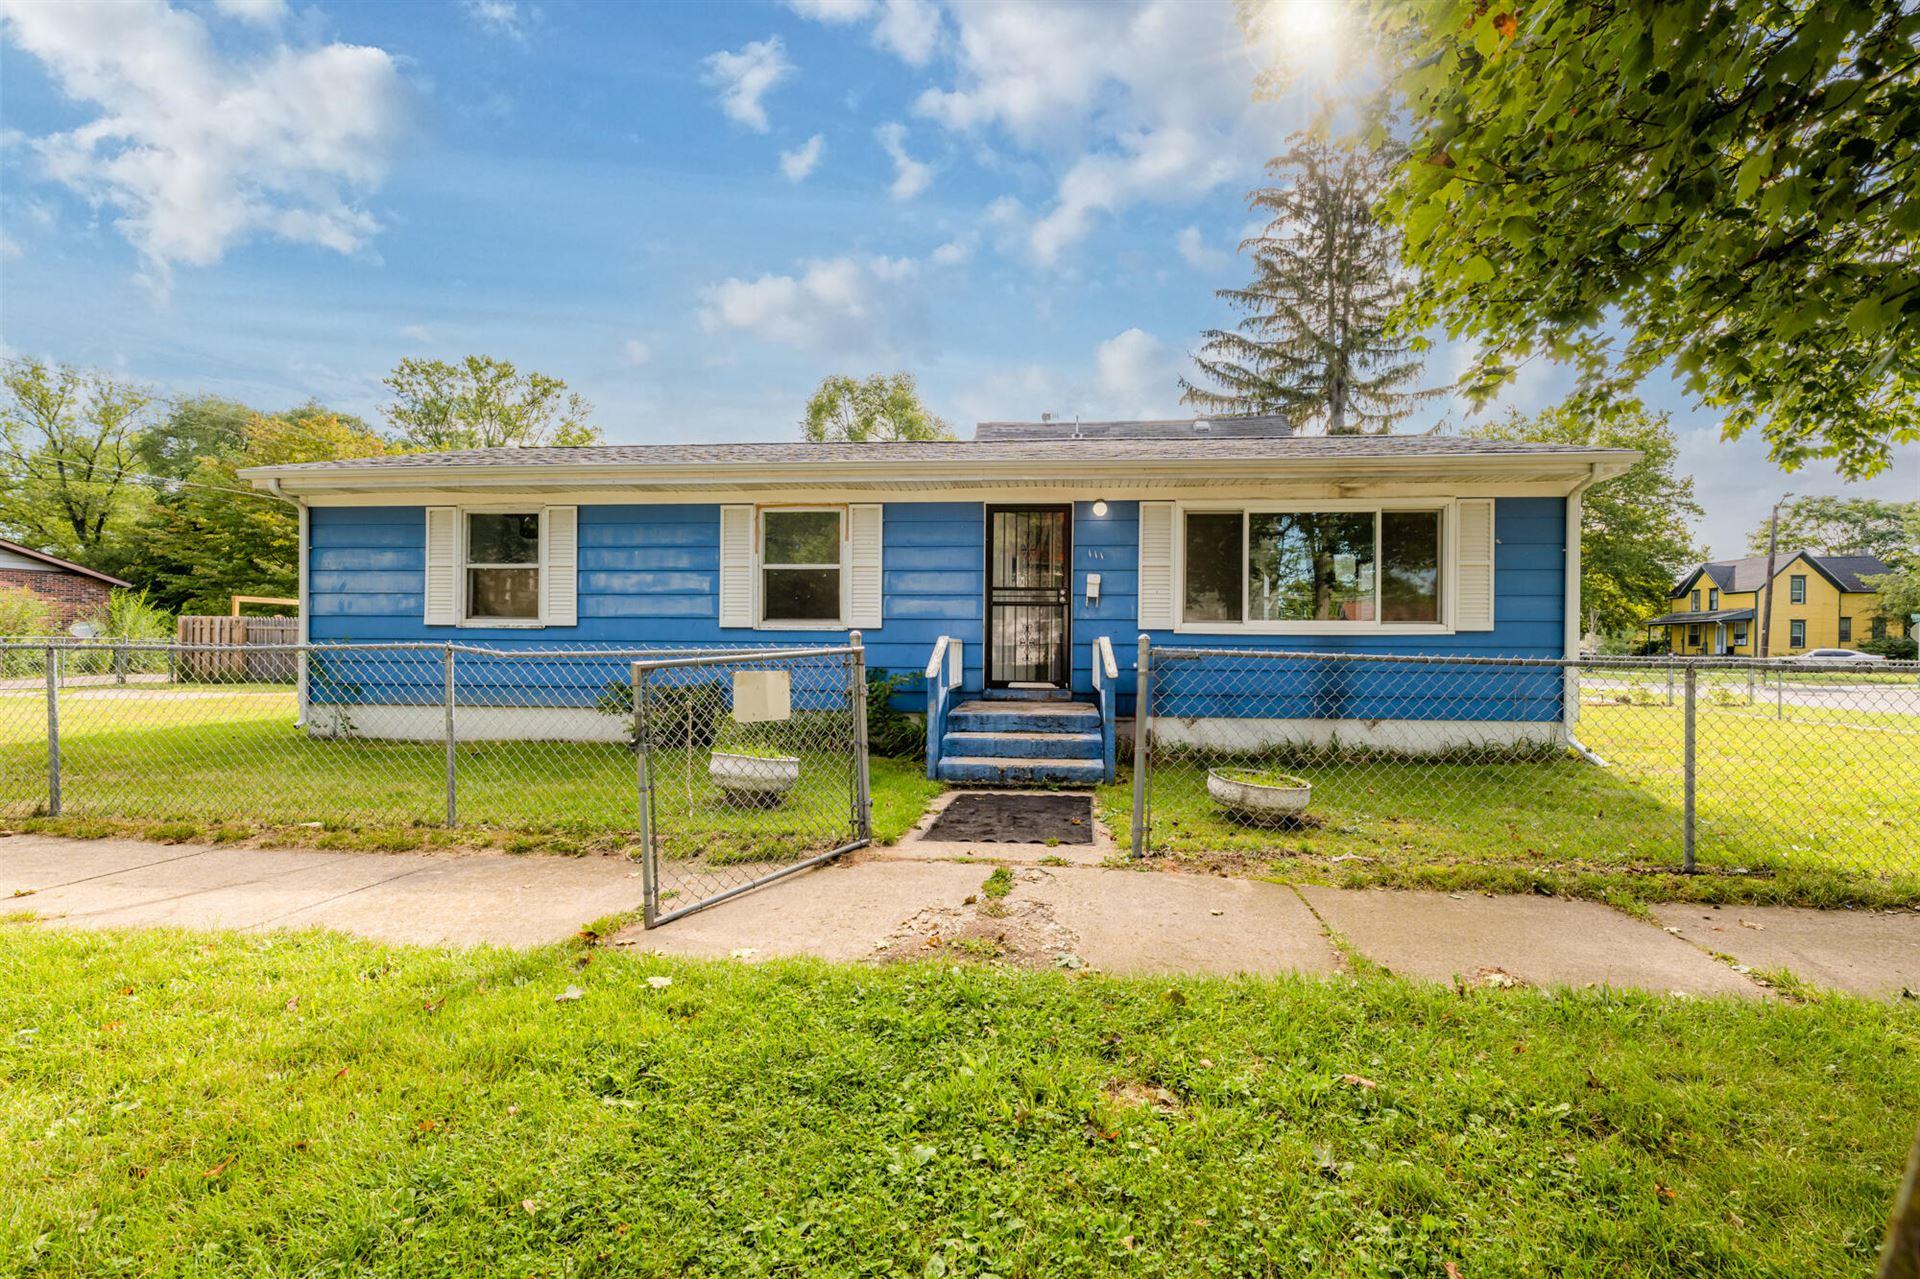 111 N Seeley Street, Benton Harbor, MI 49022 - MLS#: 21103041